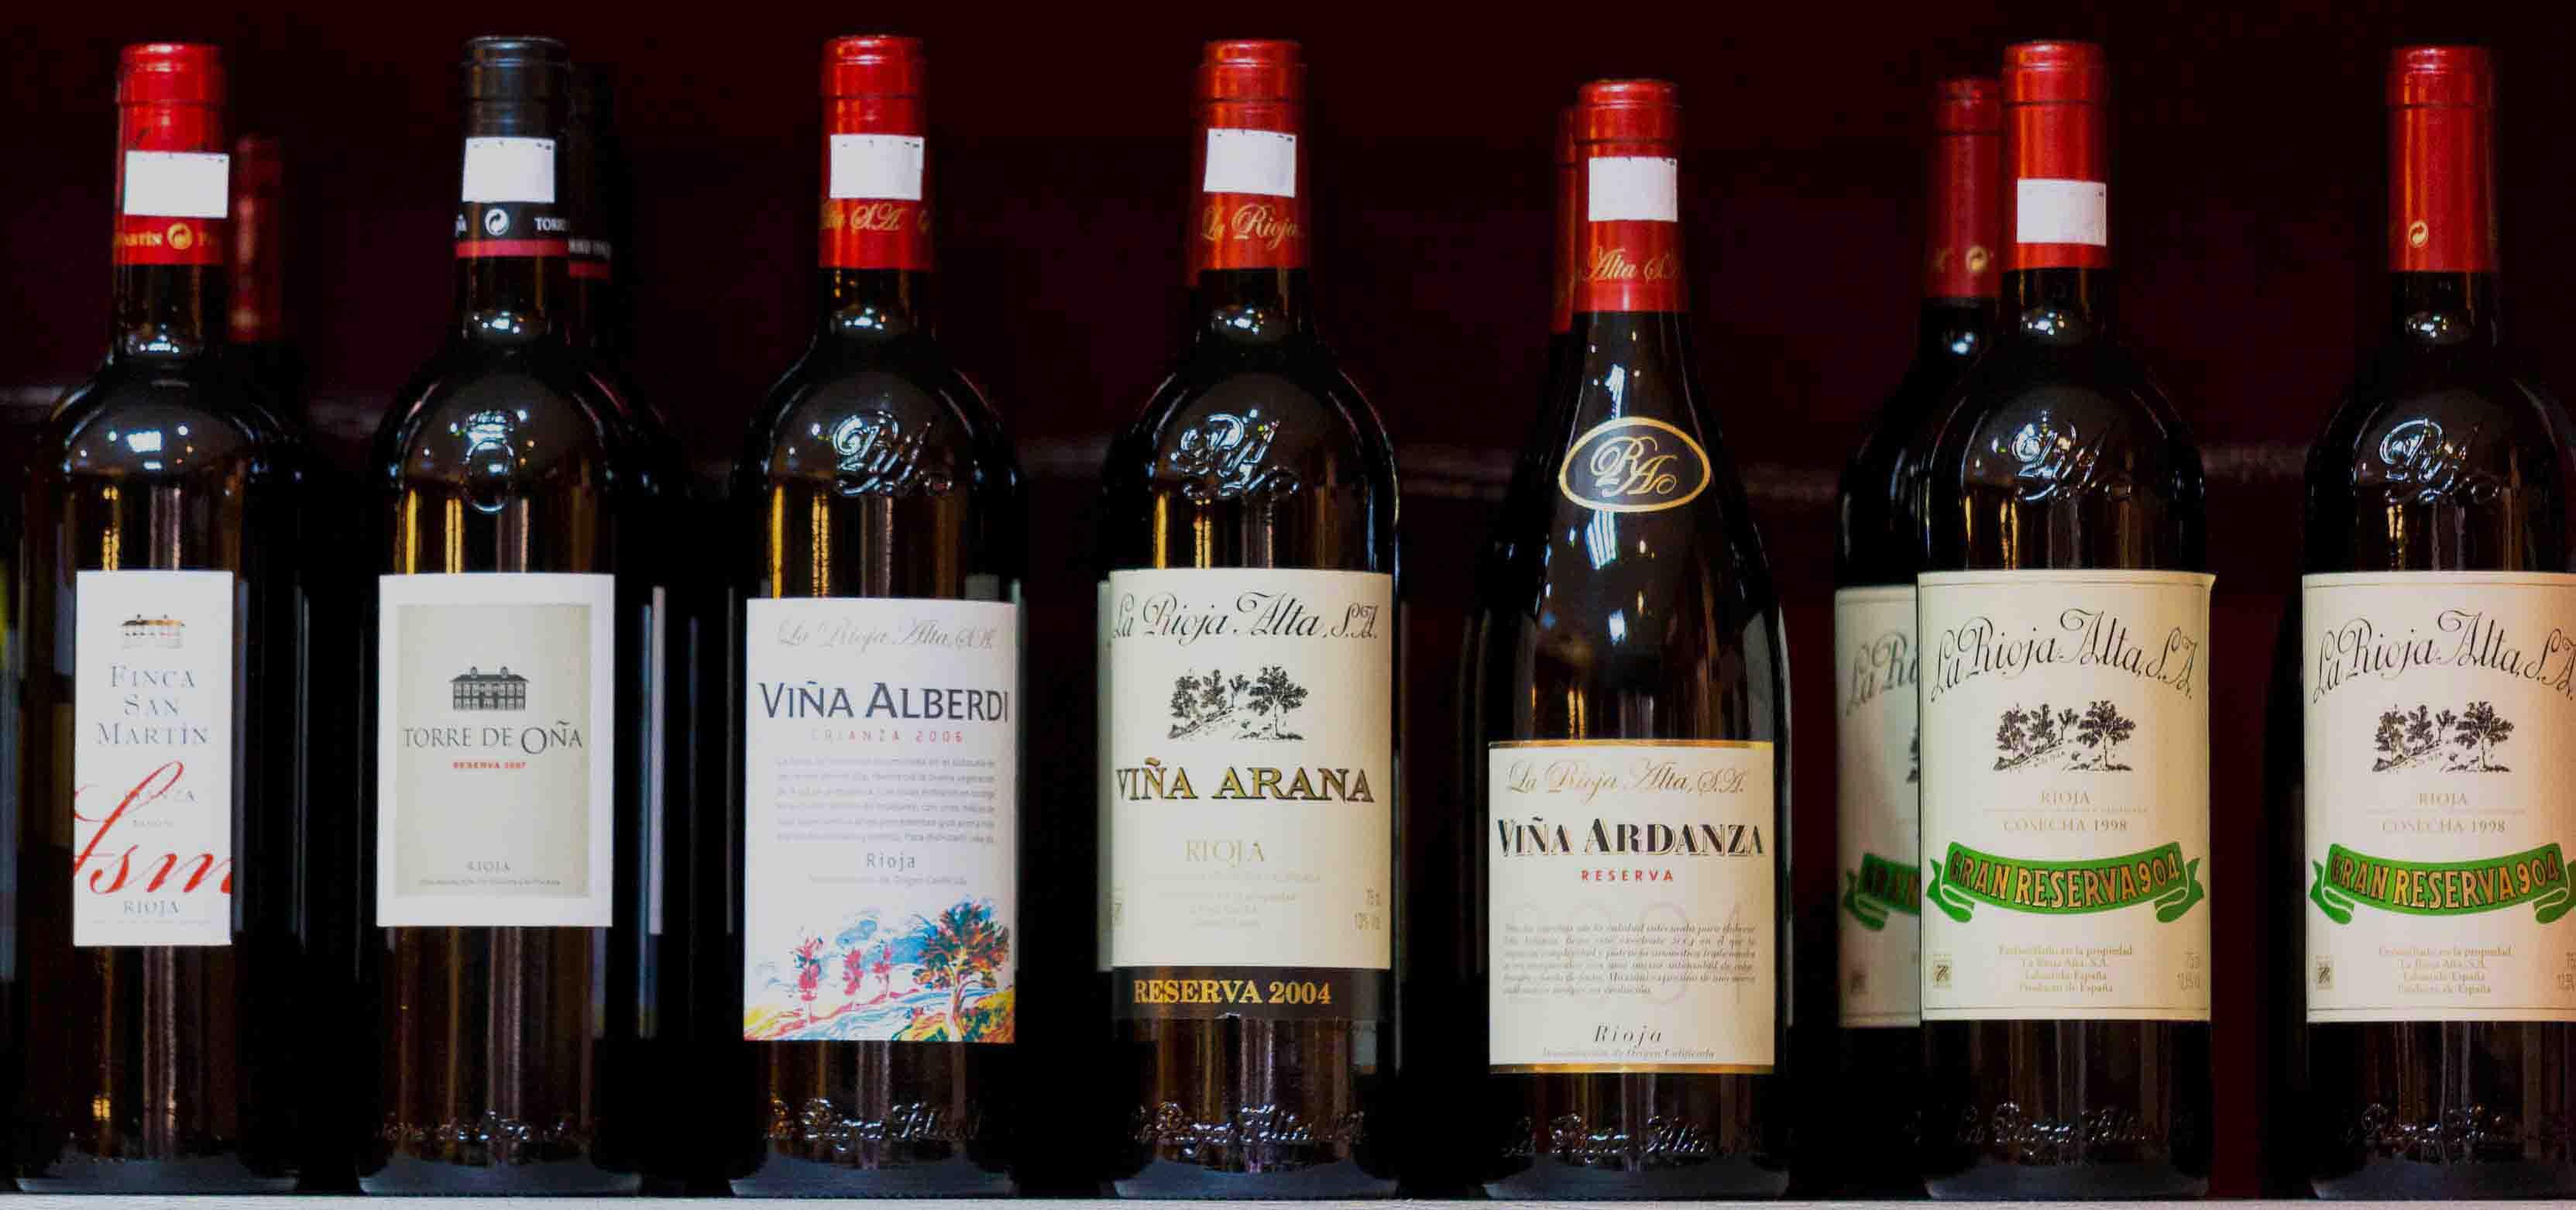 Wijnhuis La Rioja Alta